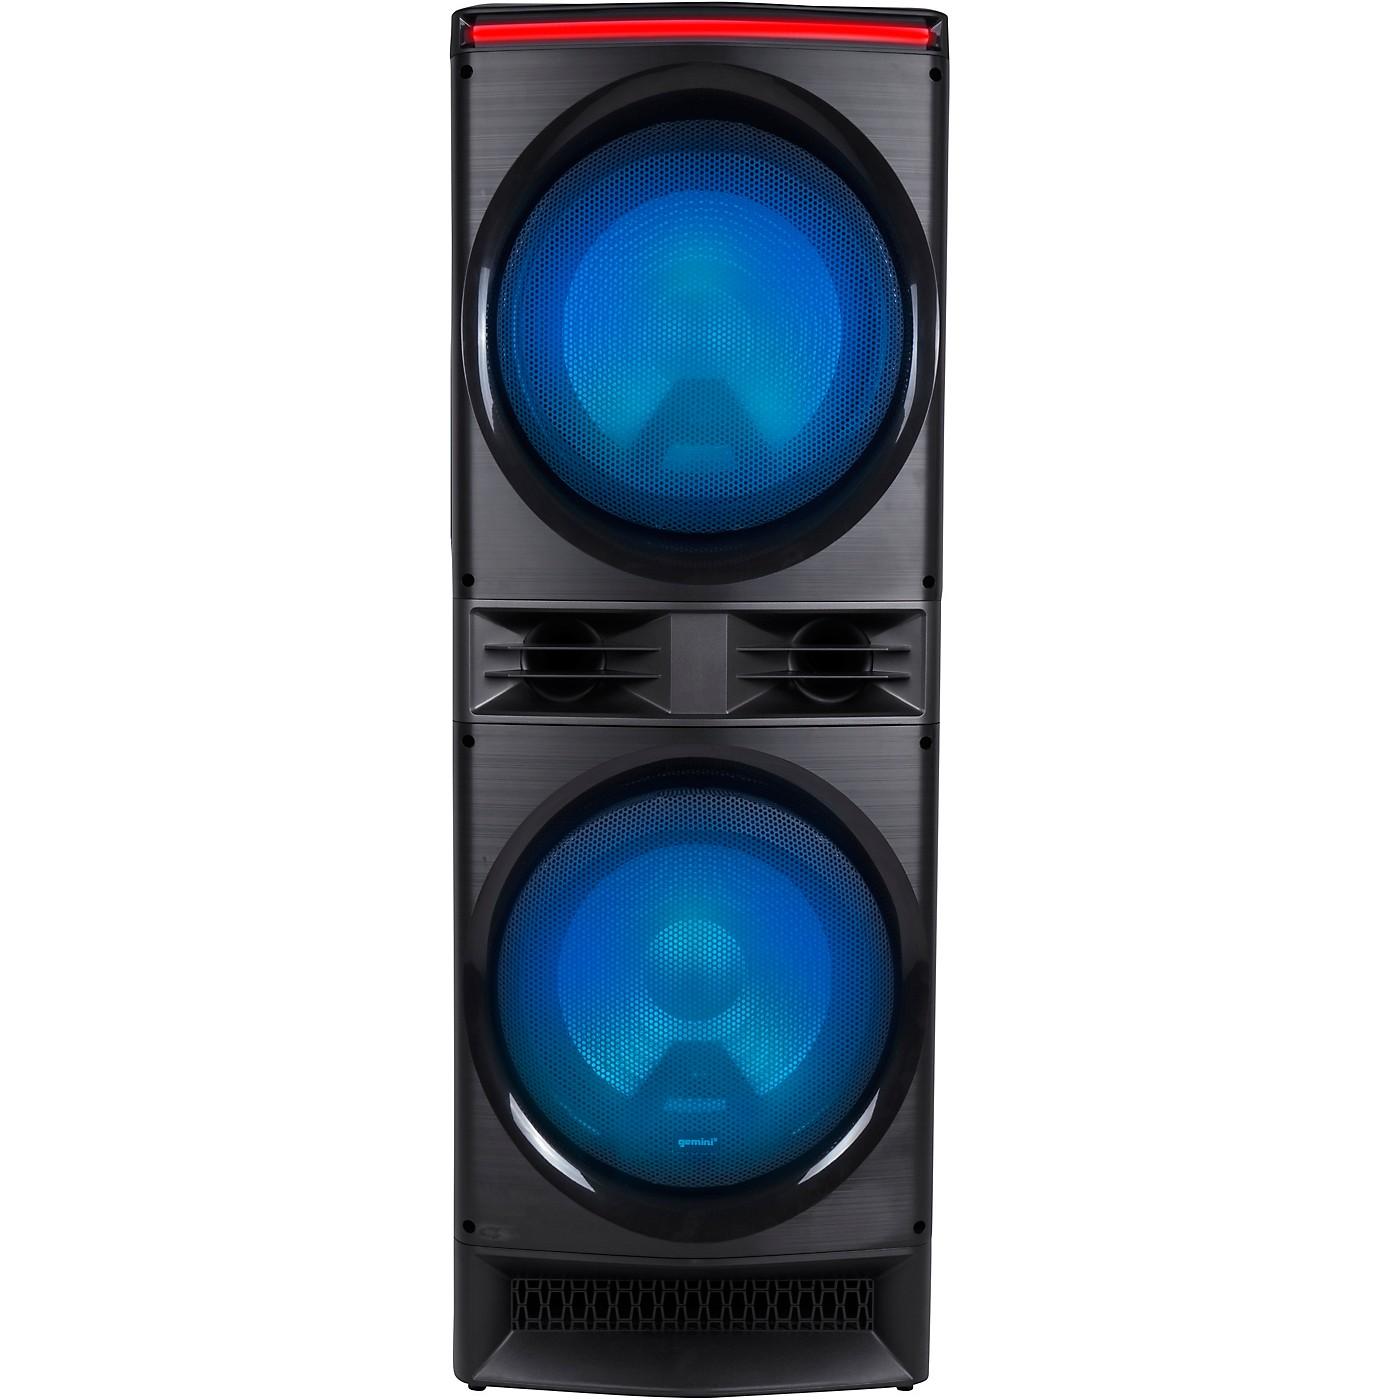 Gemini GPK-1200 Home Karaoke Party Speaker thumbnail